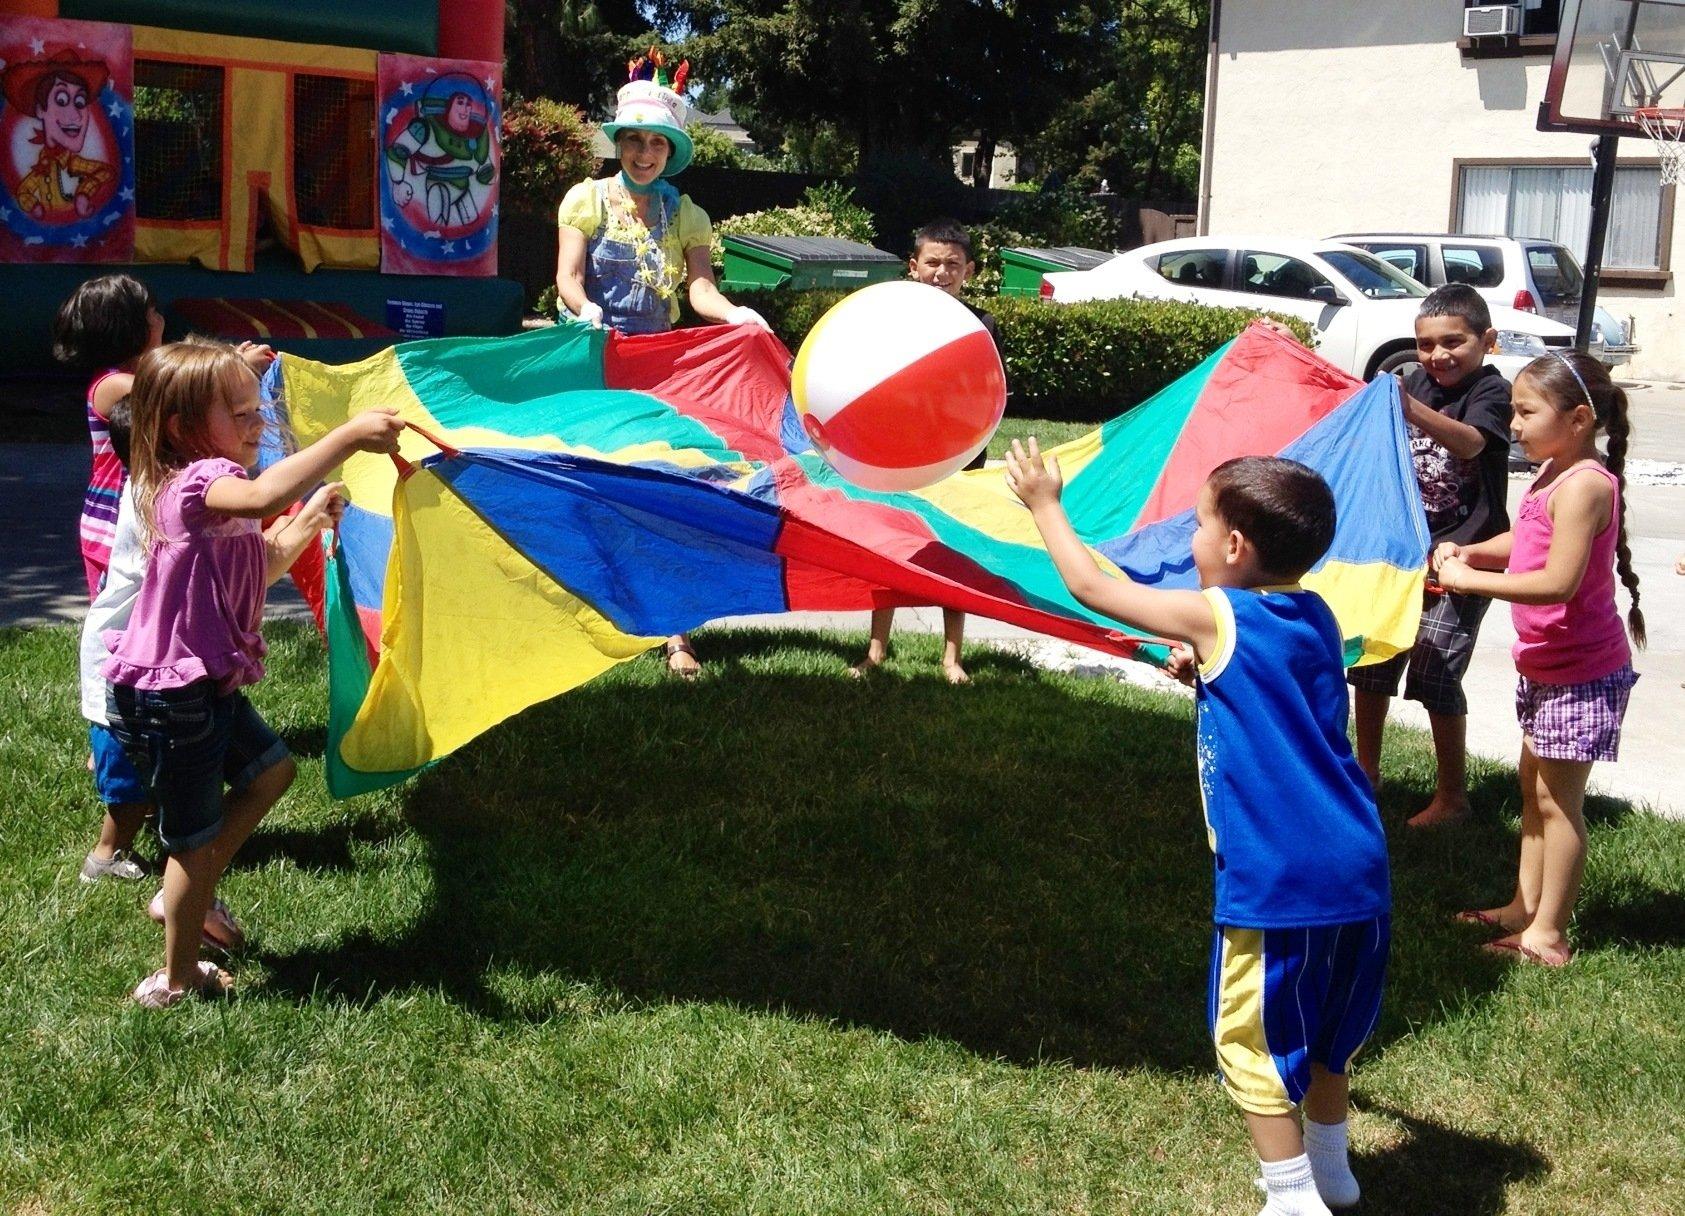 10 Fantastic Kids Birthday Party Entertainment Ideas educational entertainment for children kids party entertainer 1 2021